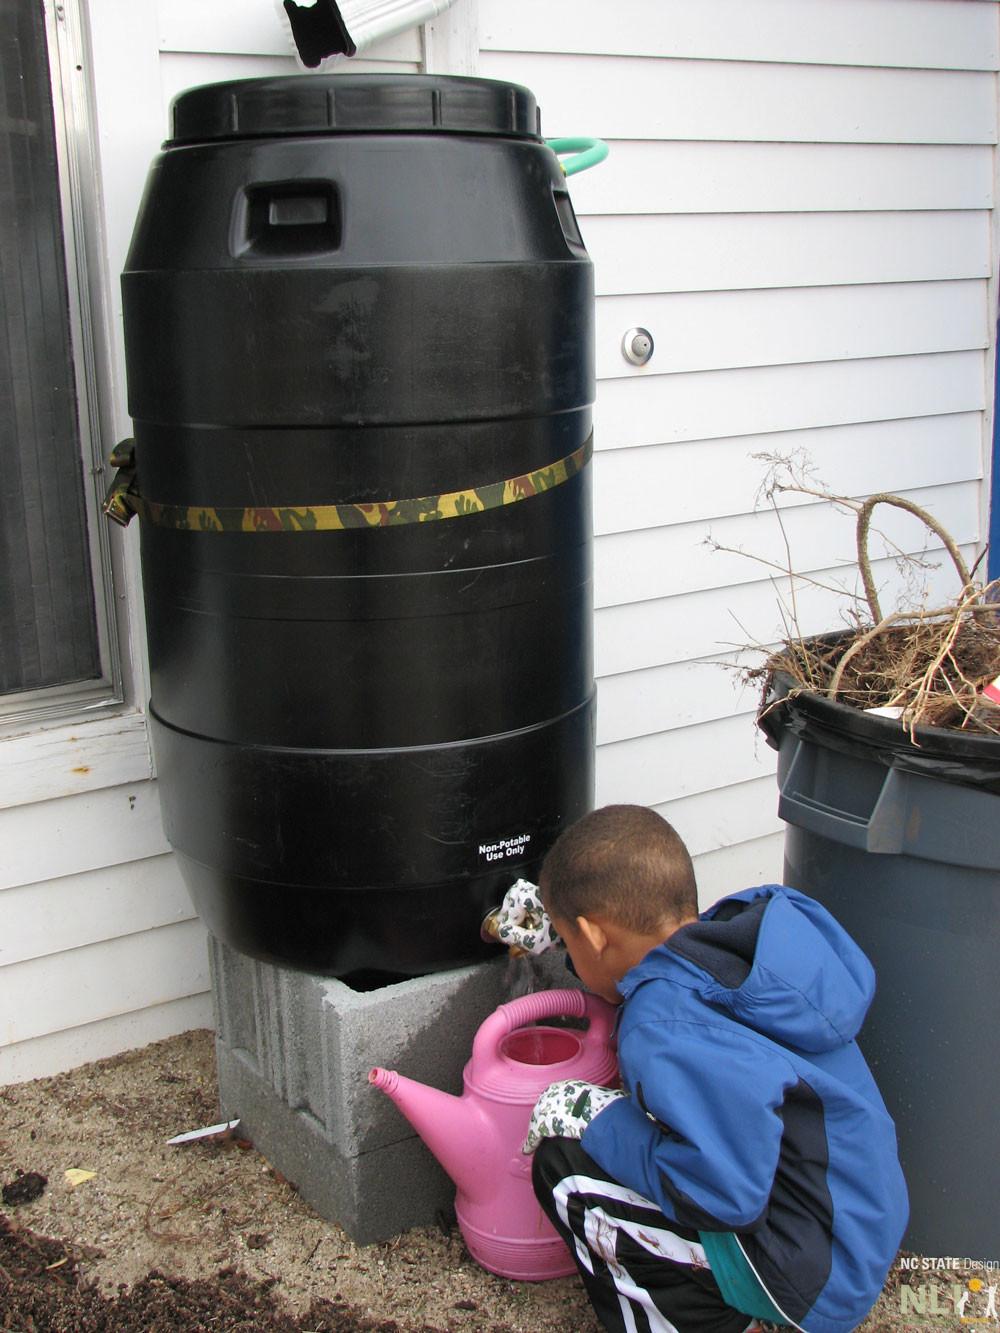 CSPU6-Rain-Barrel-child